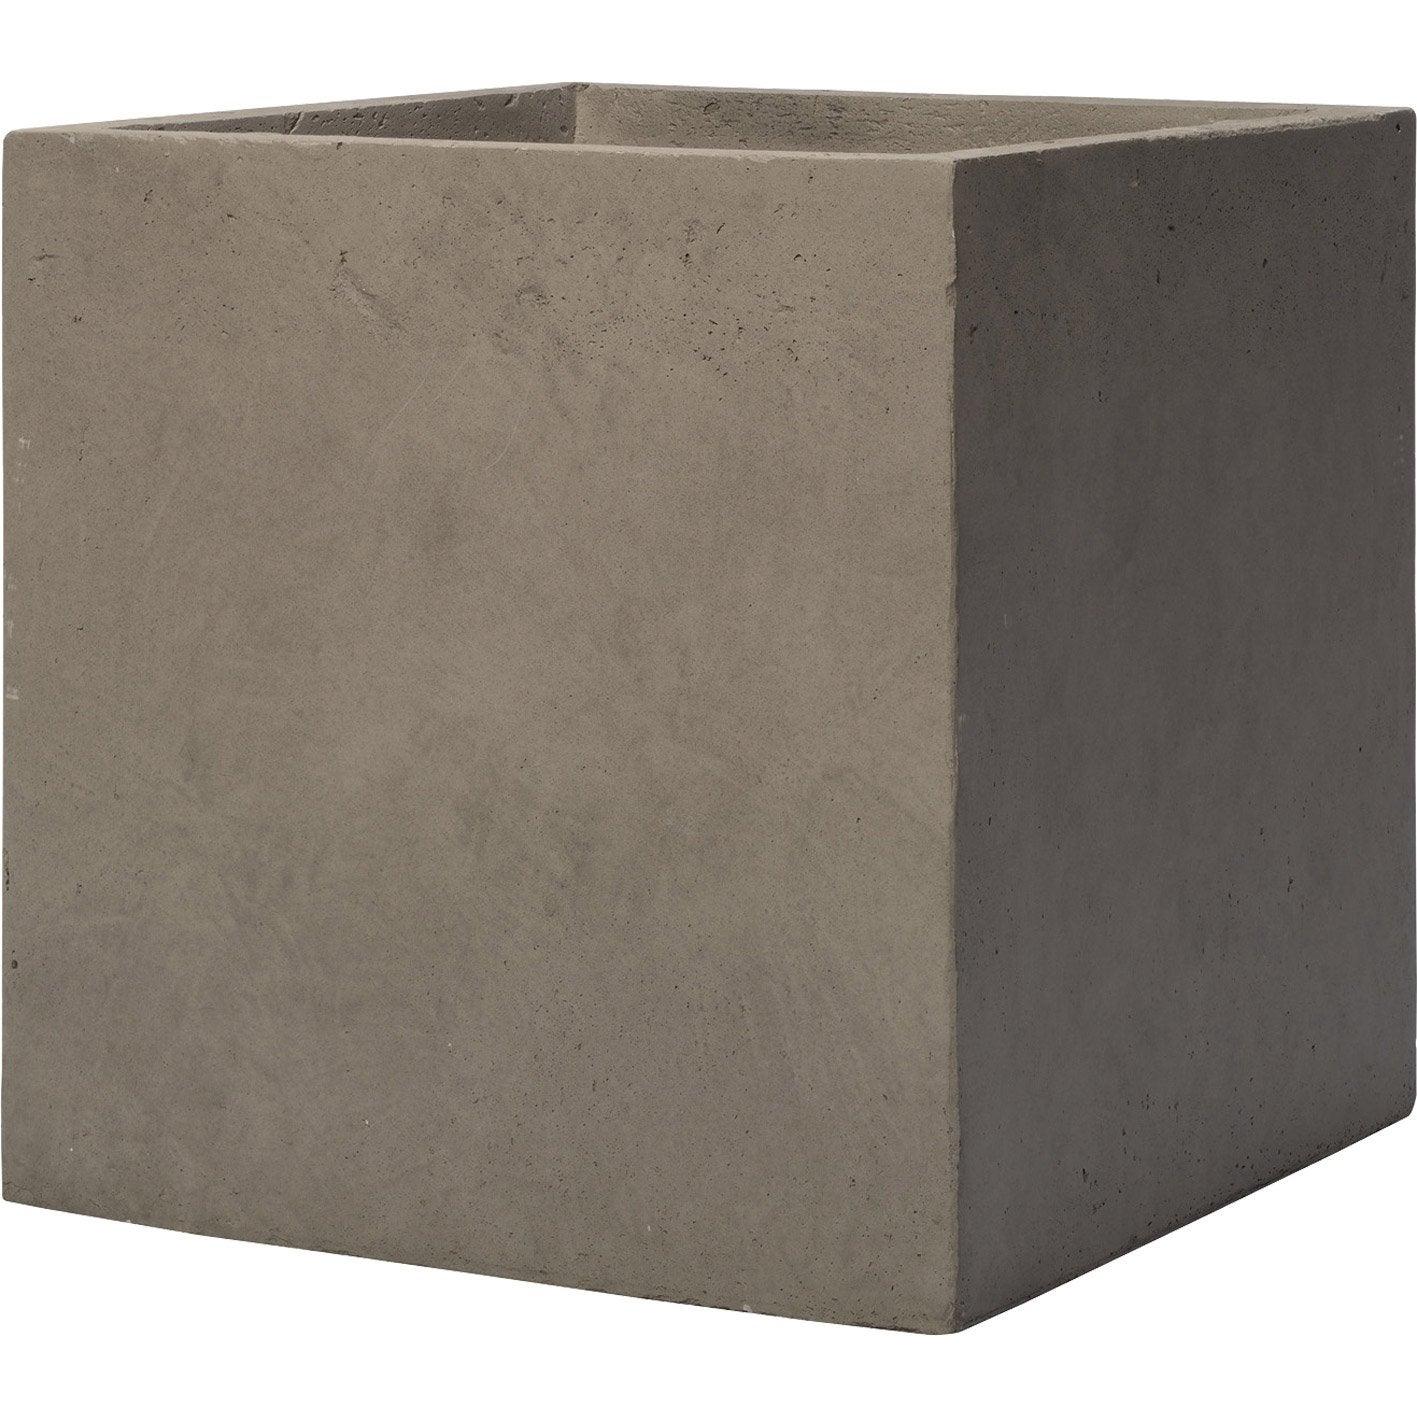 Cube fibre deroma x cm taupe leroy merlin for Cube leroy merlin